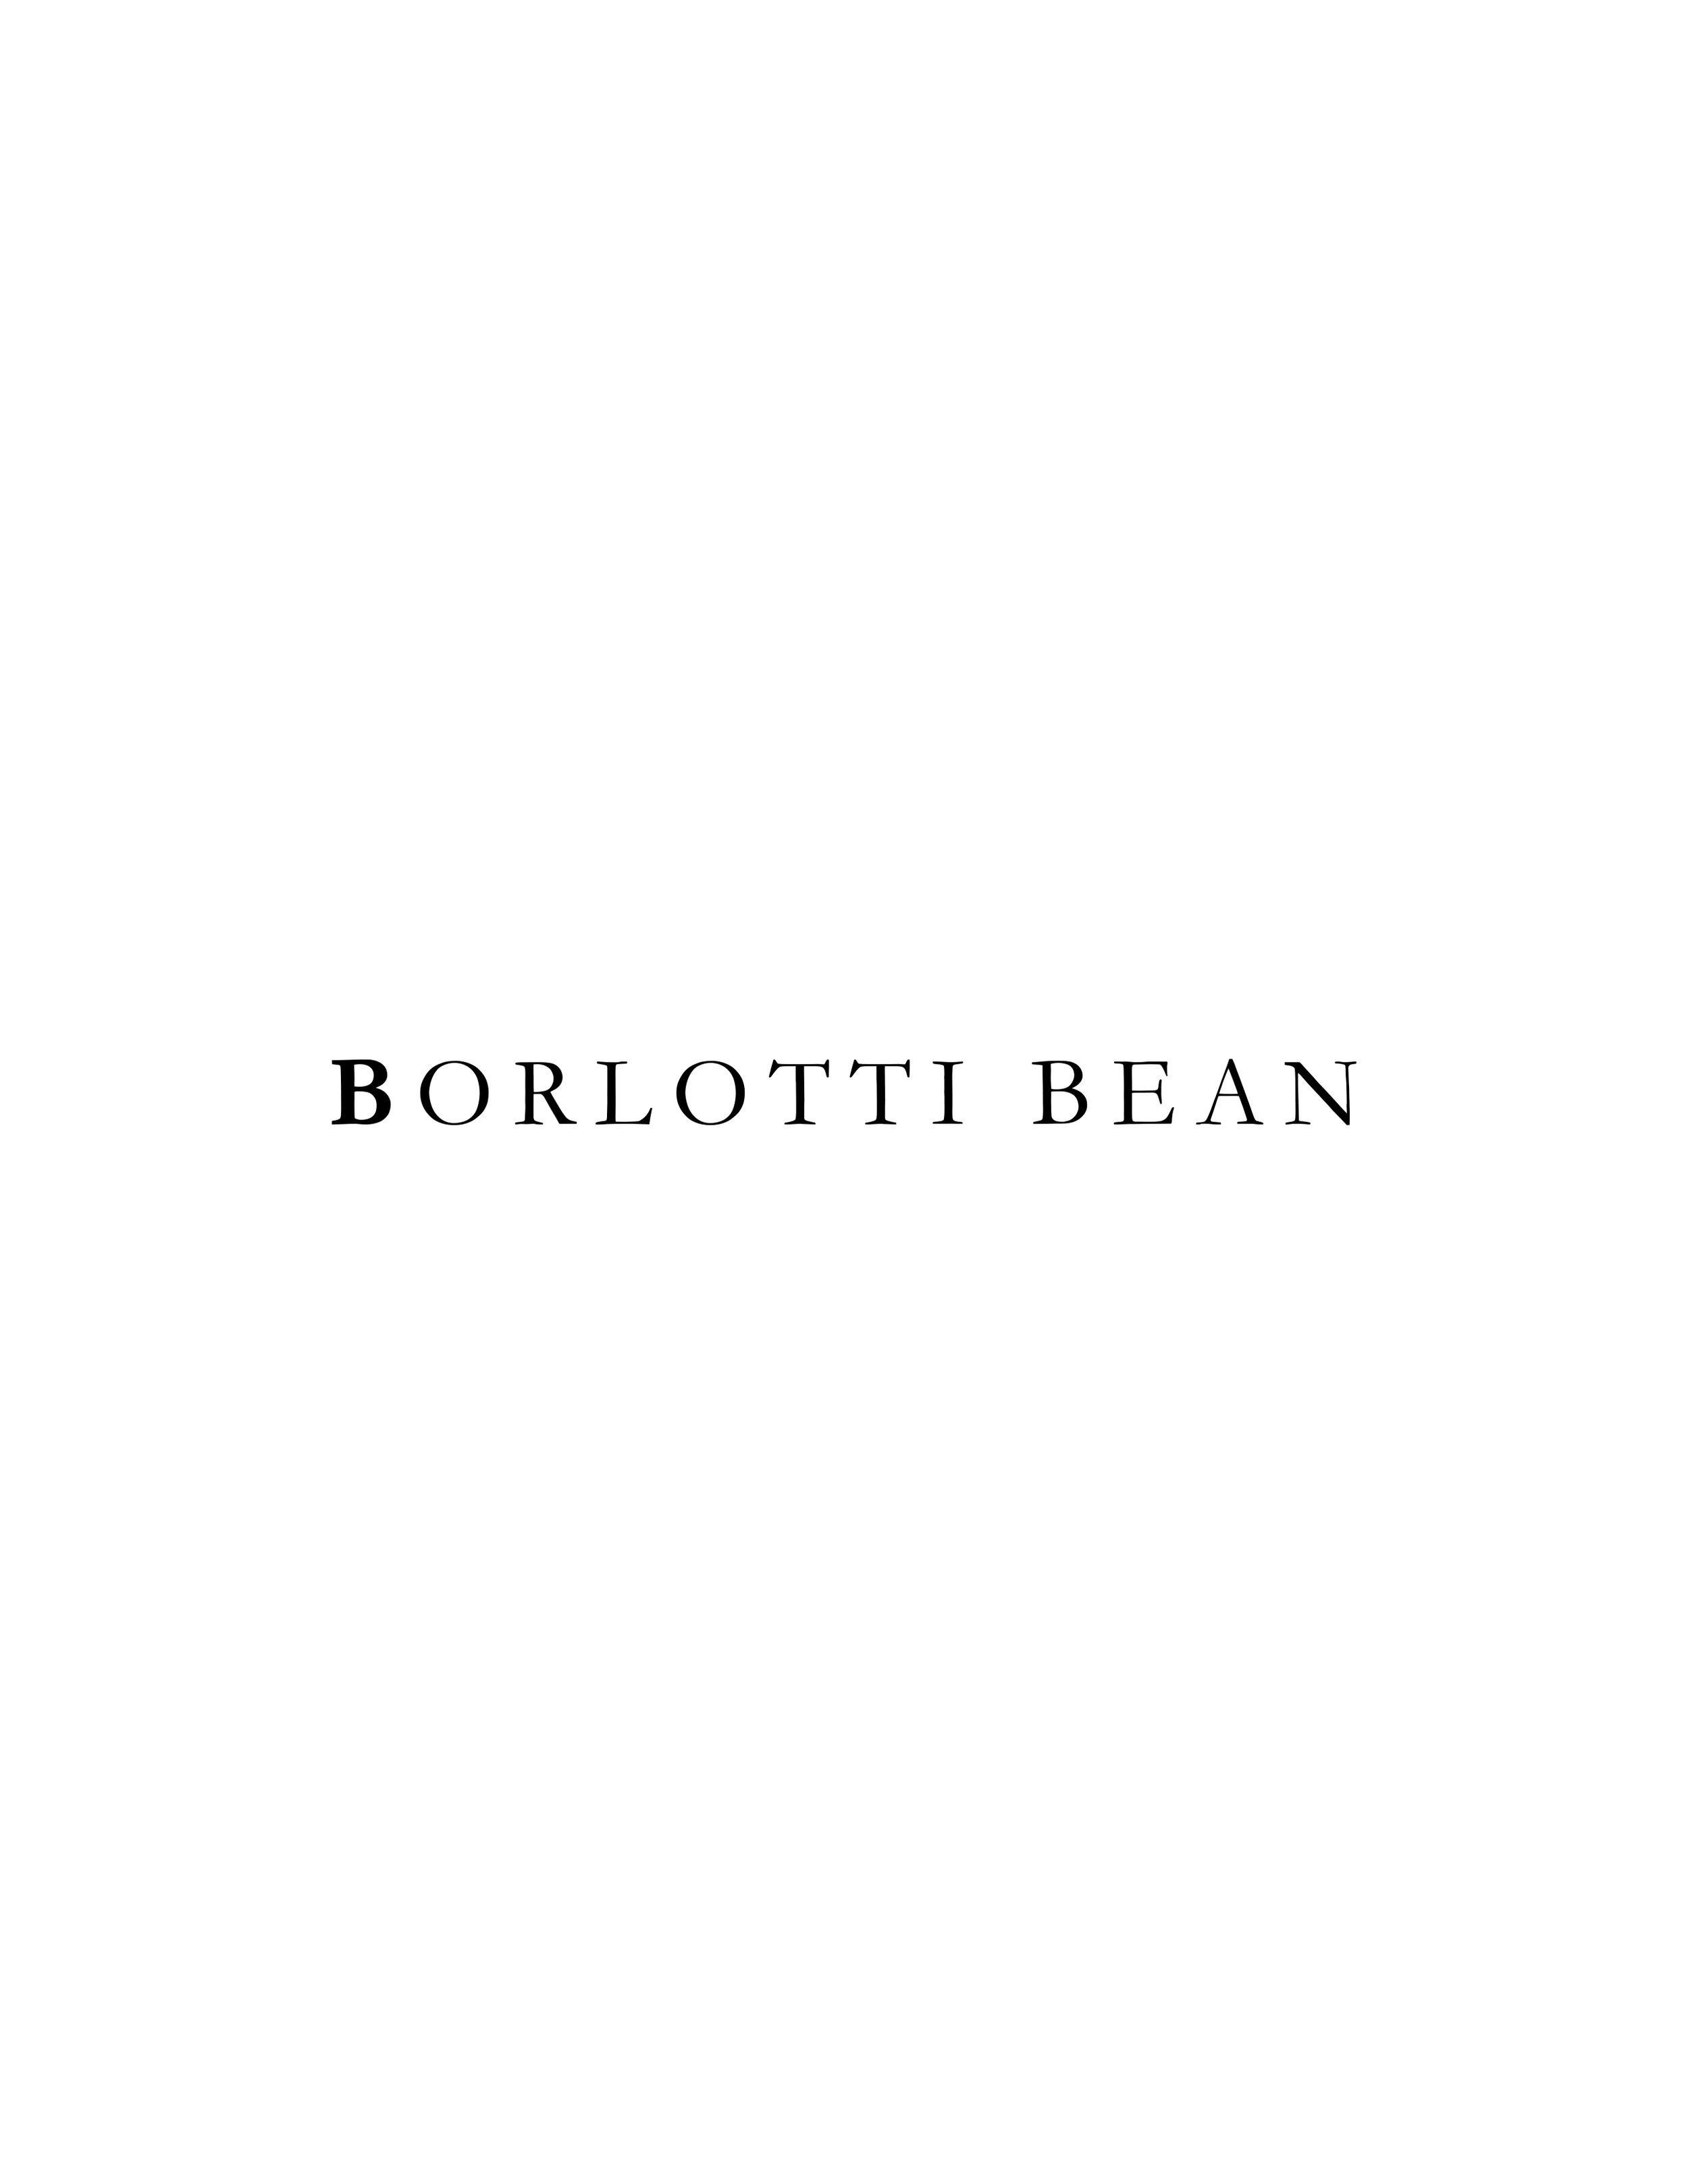 Borlotti Bean Text.jpg